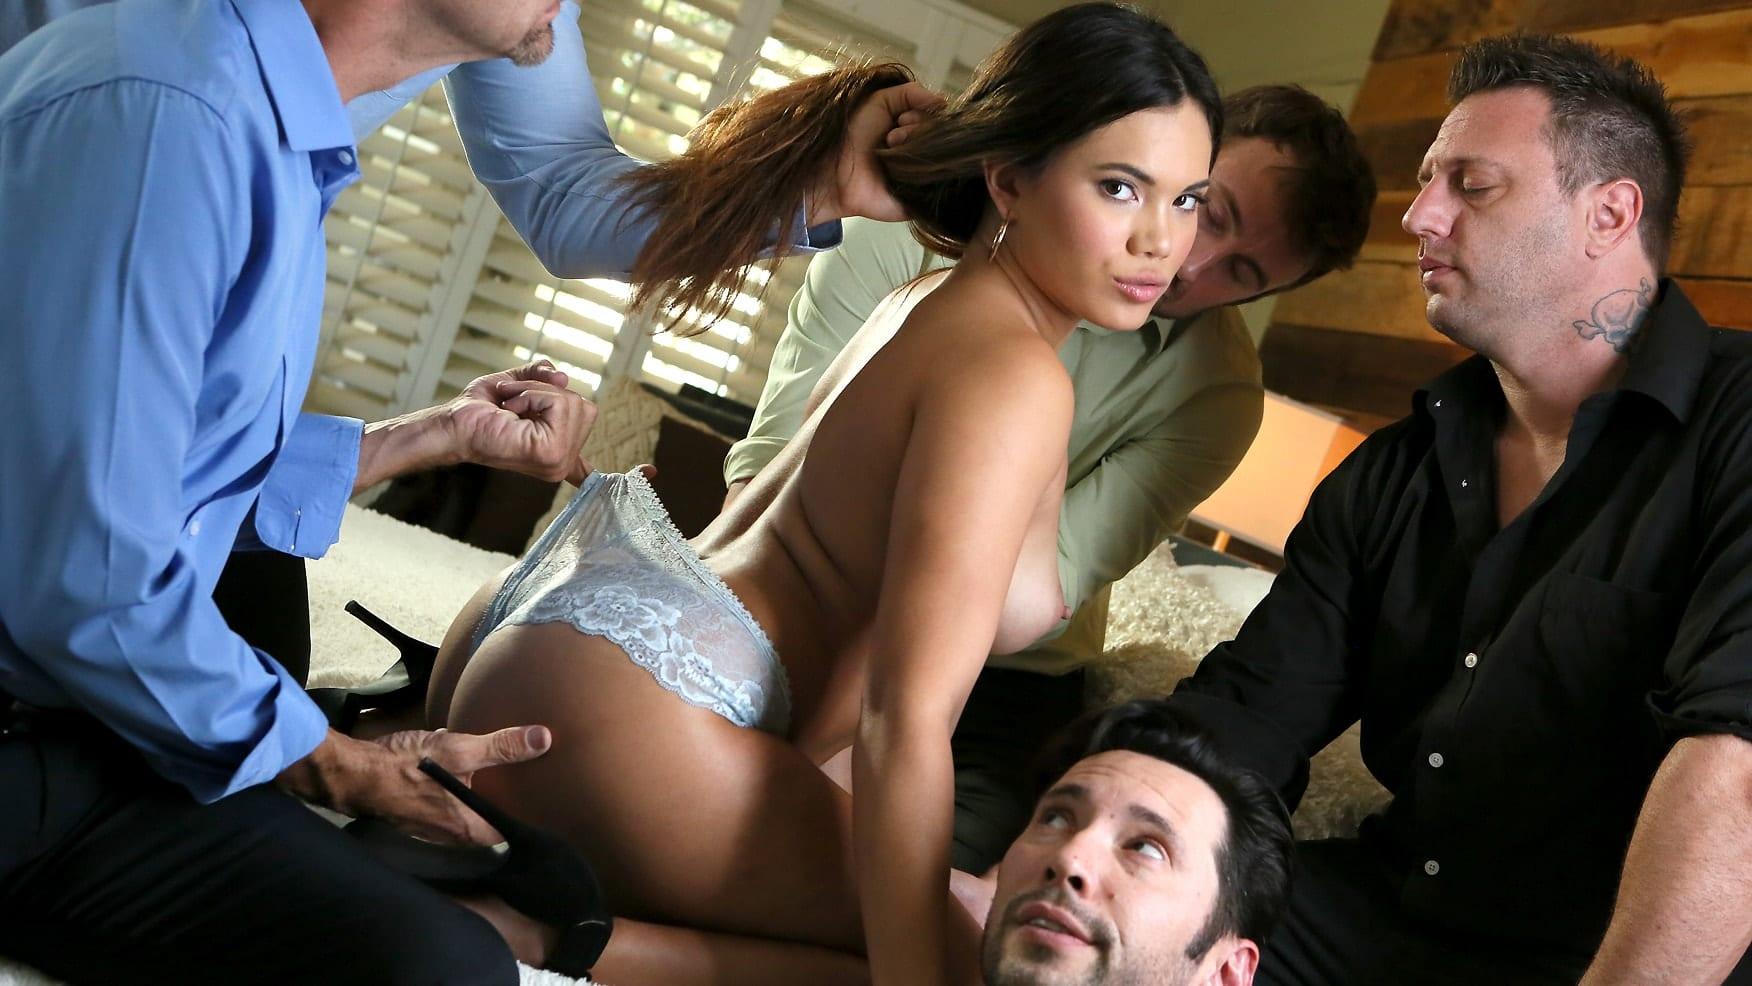 New Sensations Pornstar Gets Laid